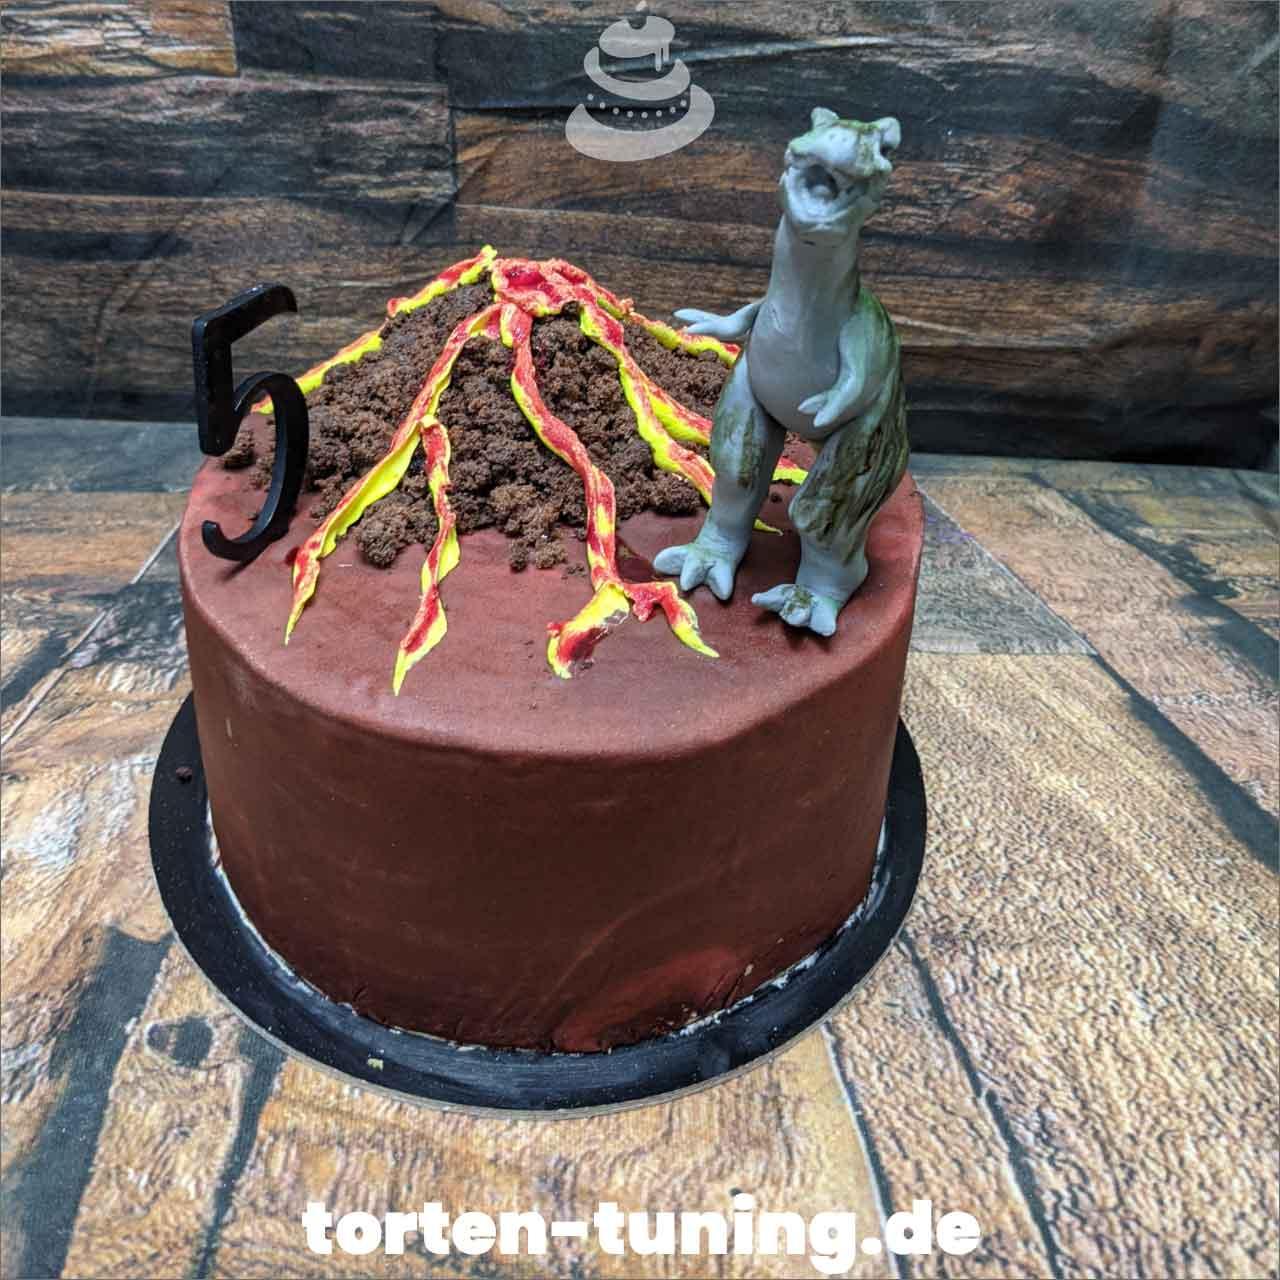 T-Rex Vulkan Dripcake Obsttorte Geburtstagstorte Motivtorte Torte Tortendekoration Torte online bestellen Suhl Thüringen Torten Tuning Sahnetorte Tortenfiguren Cake Topper